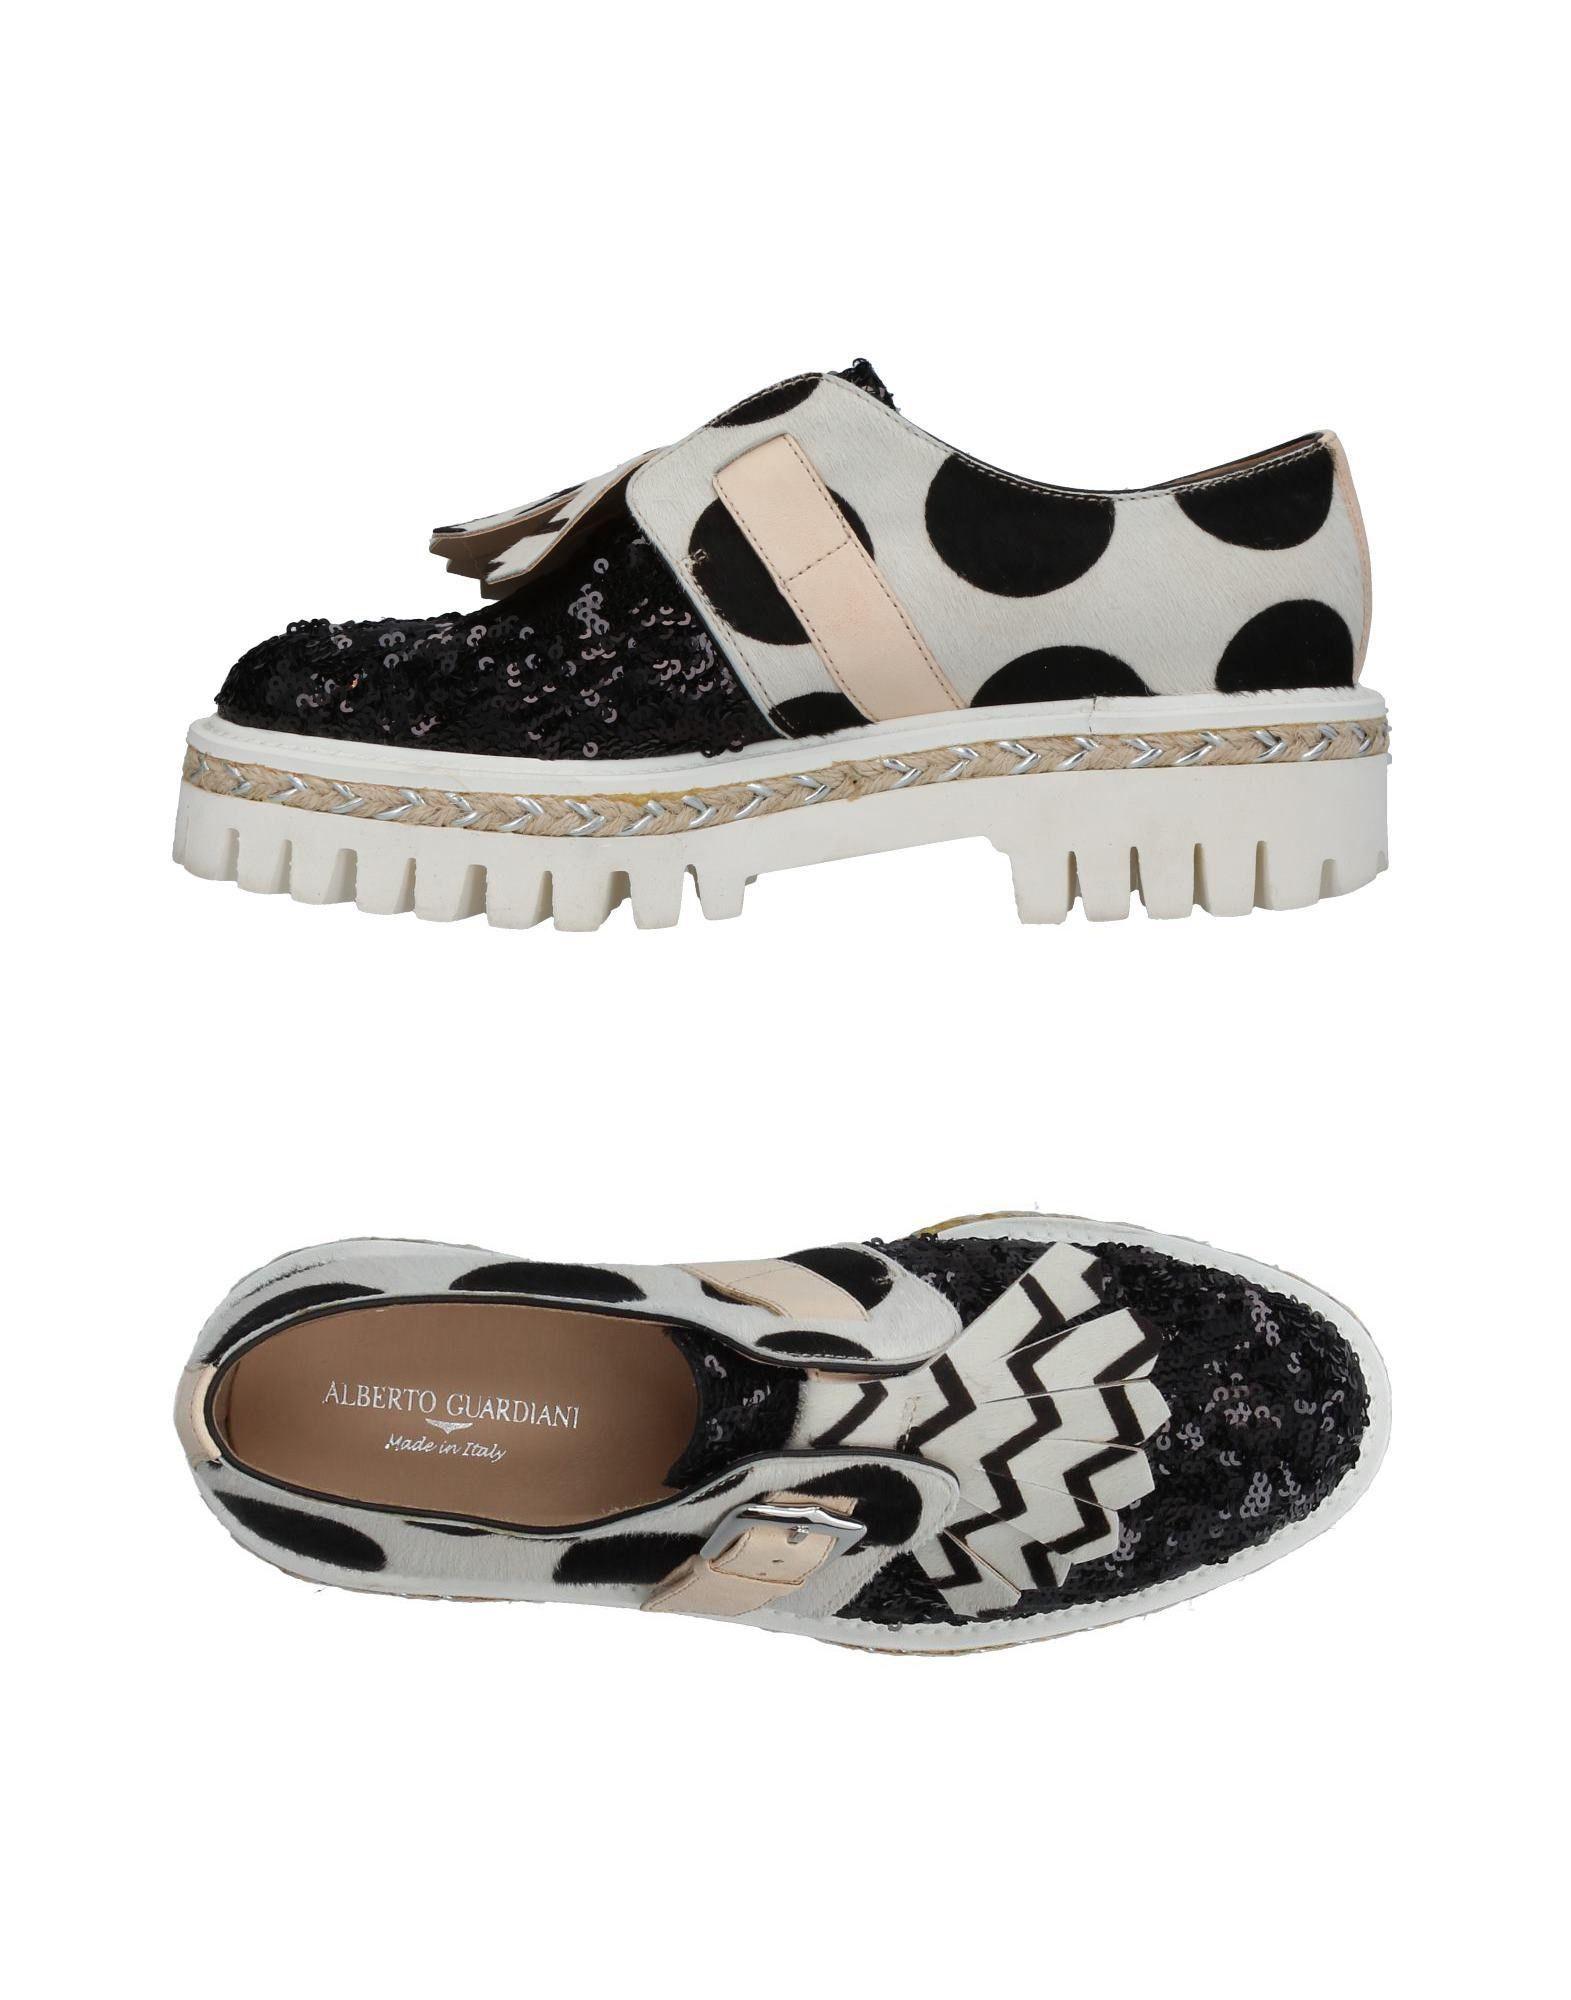 Alberto Guardiani Mokassins Damen  11402253LE Gute Qualität beliebte Schuhe